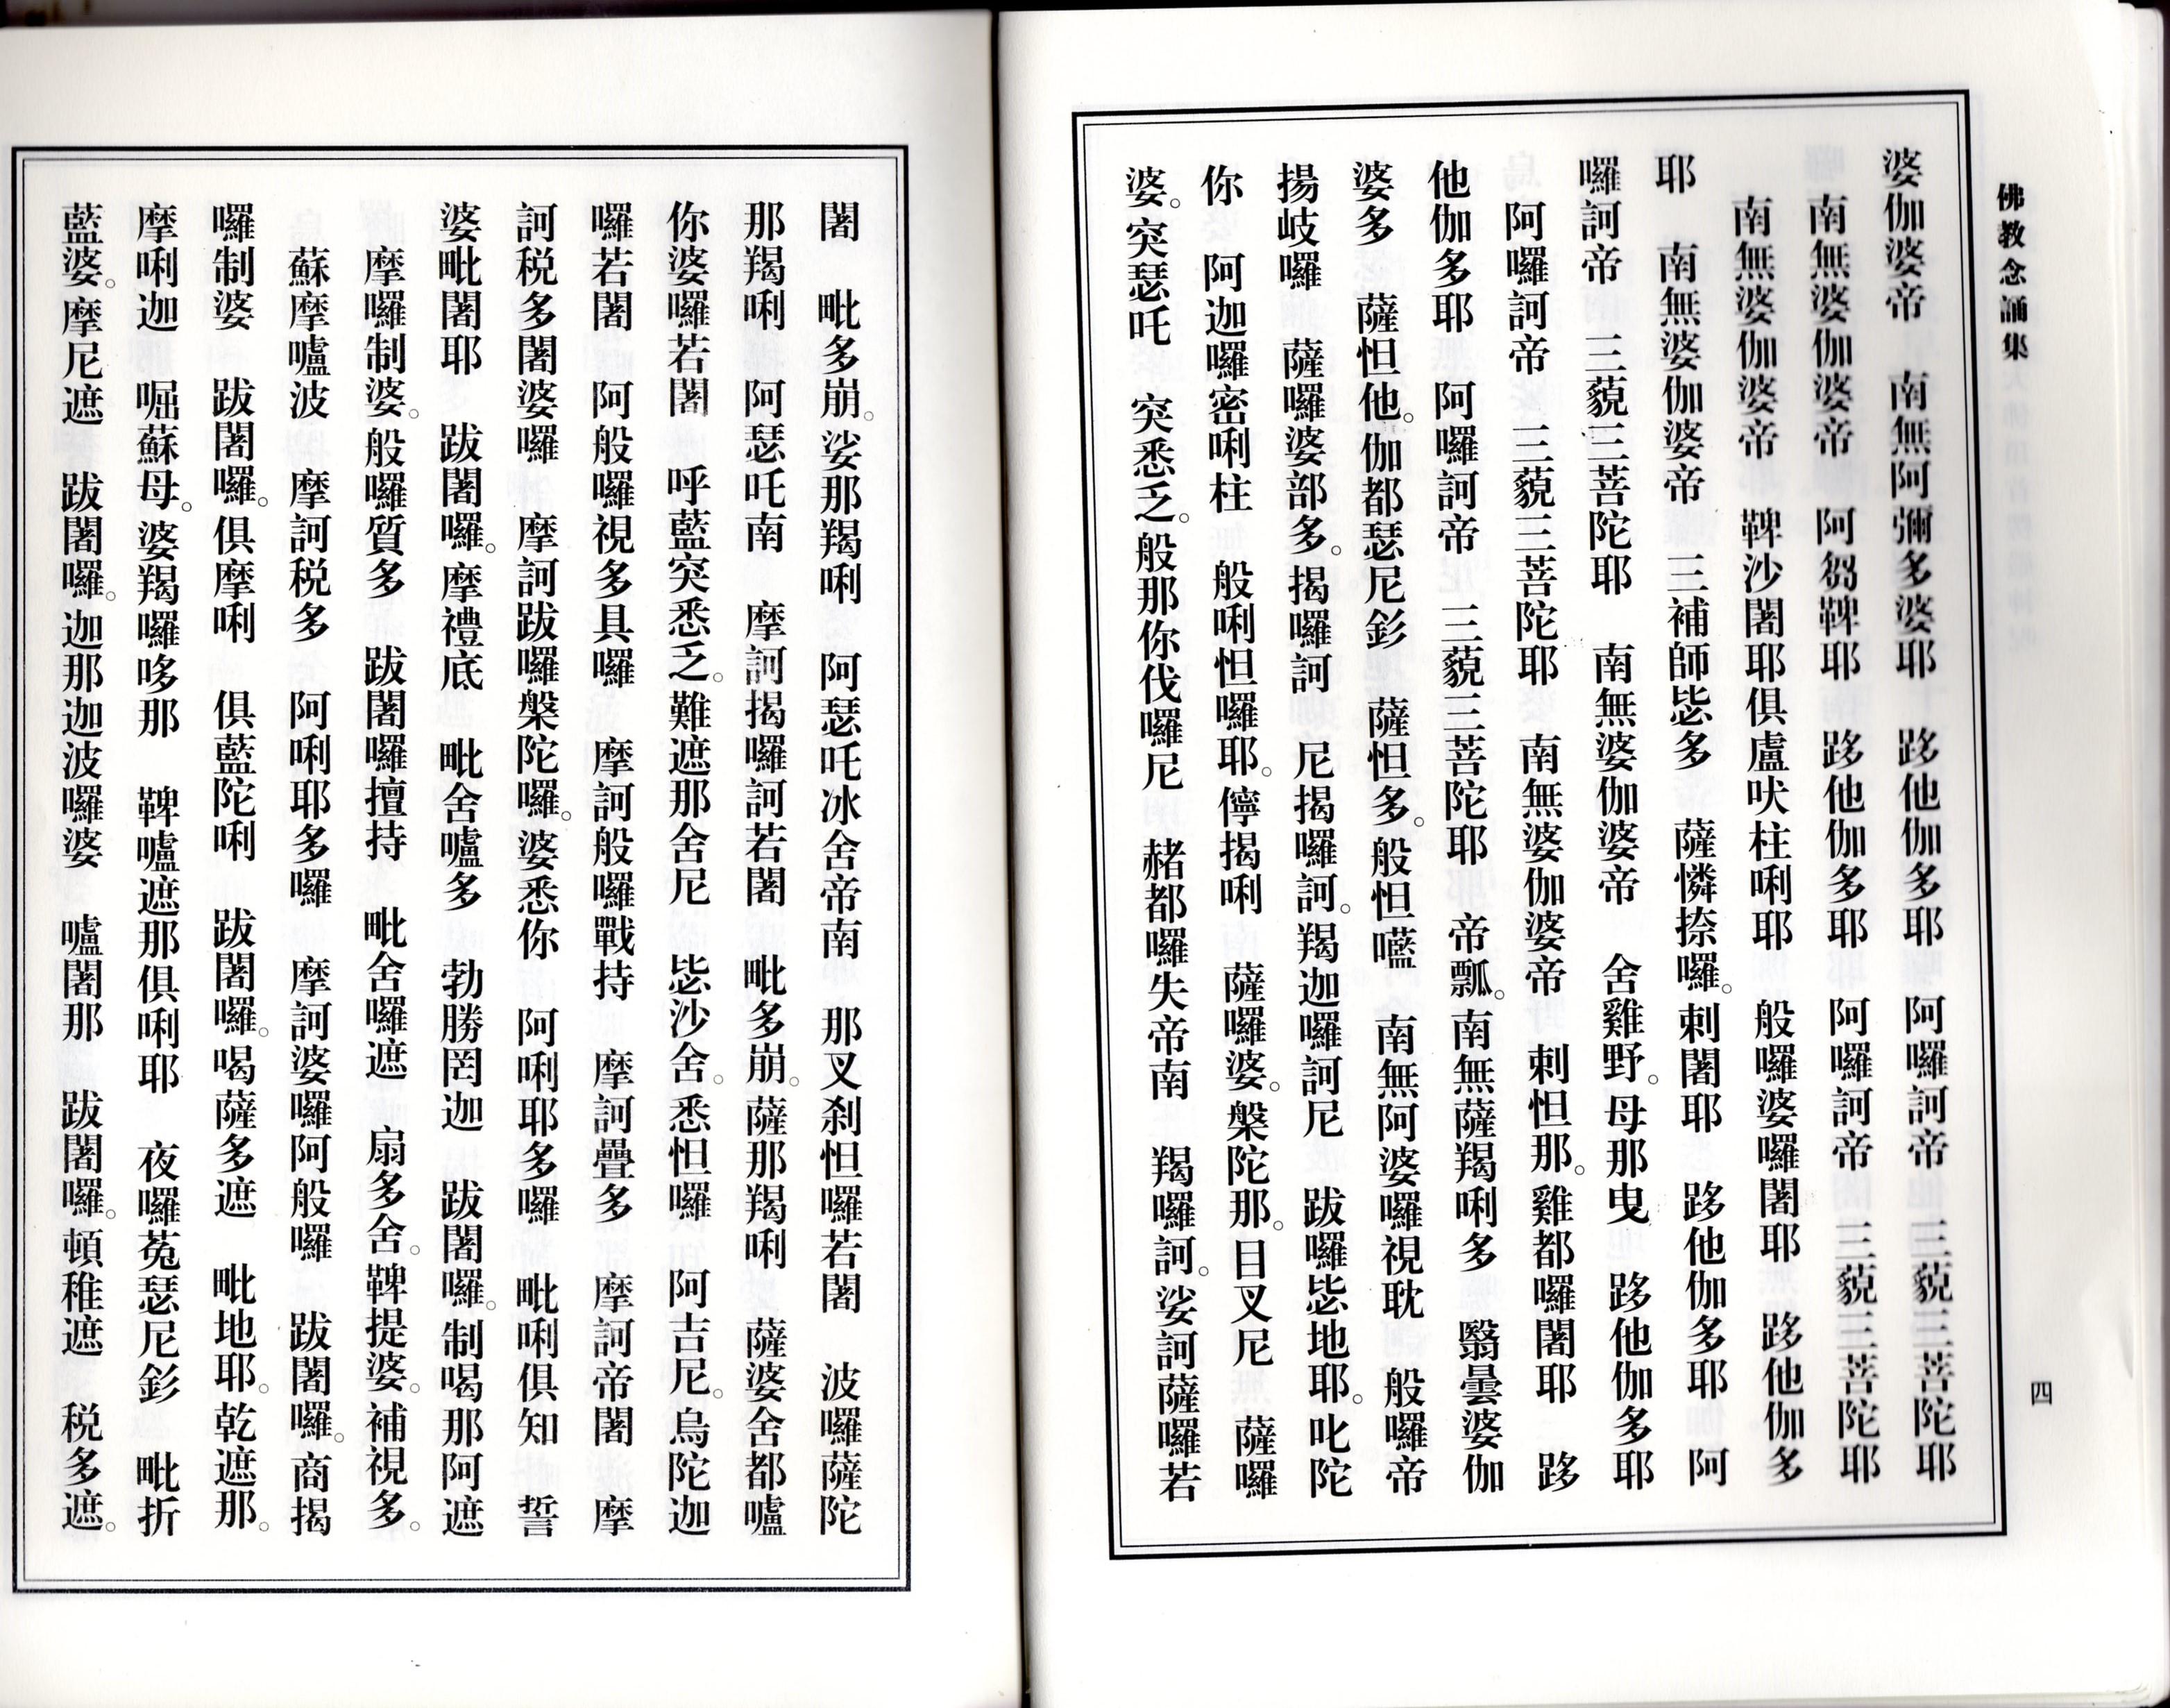 http://www.wutaishanfojiao.com/uploadfile/2014/1016/20141016072134965.jpg